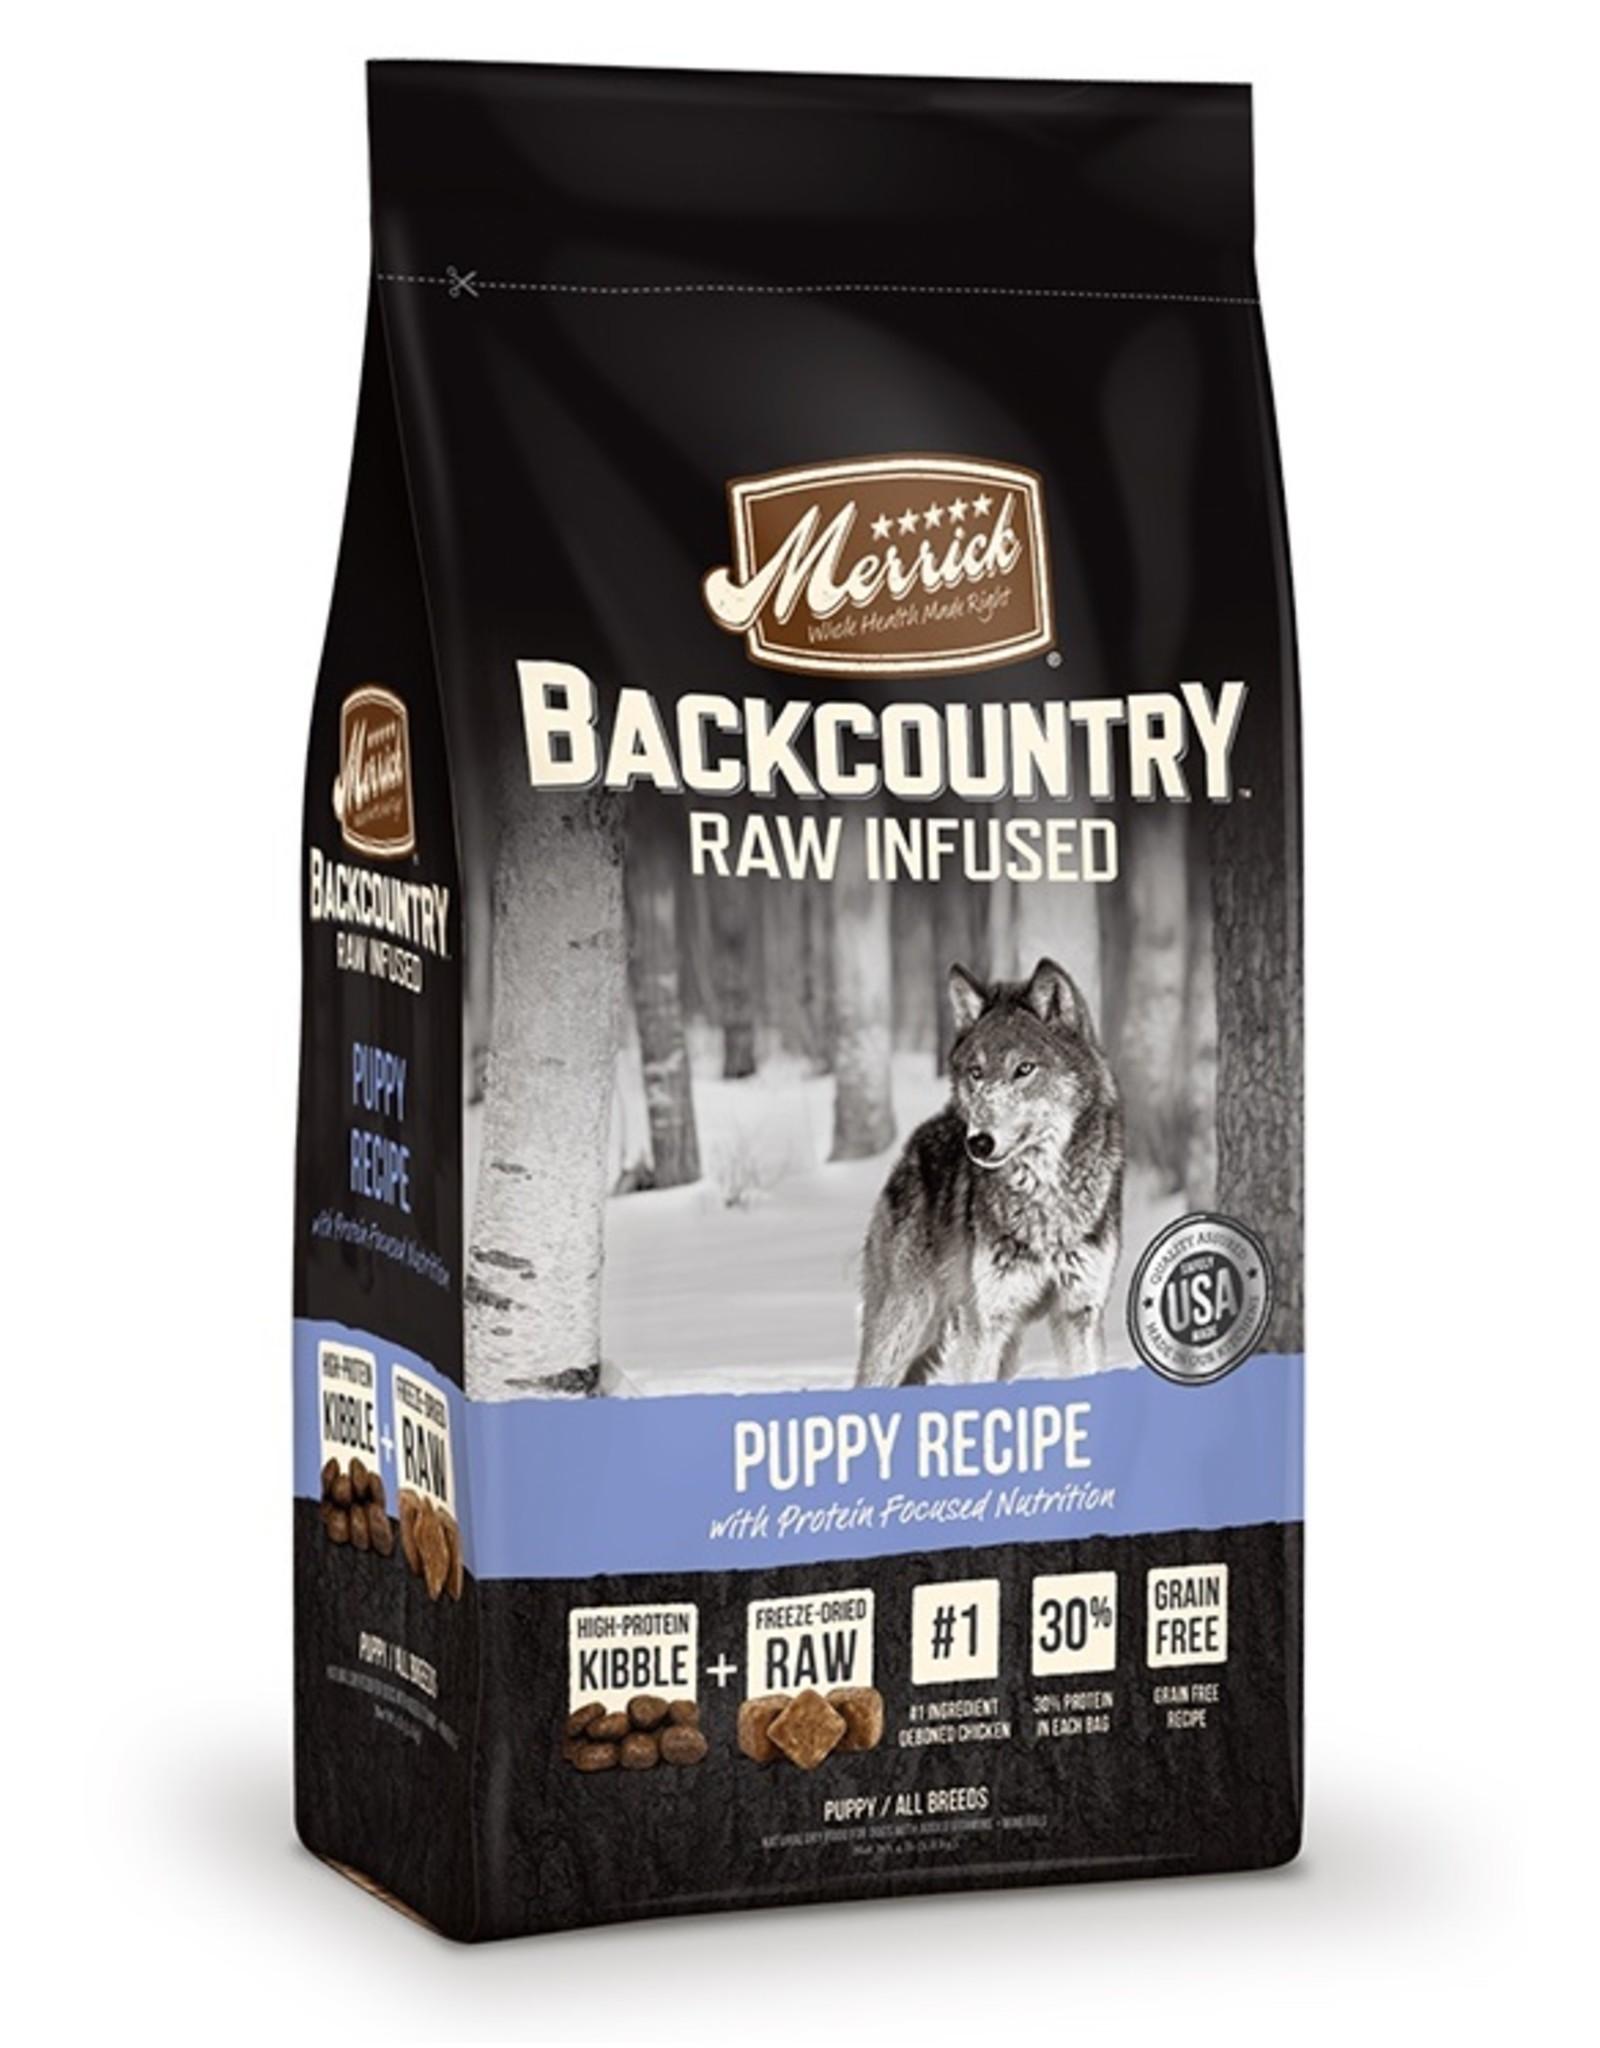 Merrick Merrick Backcountry Dog Food